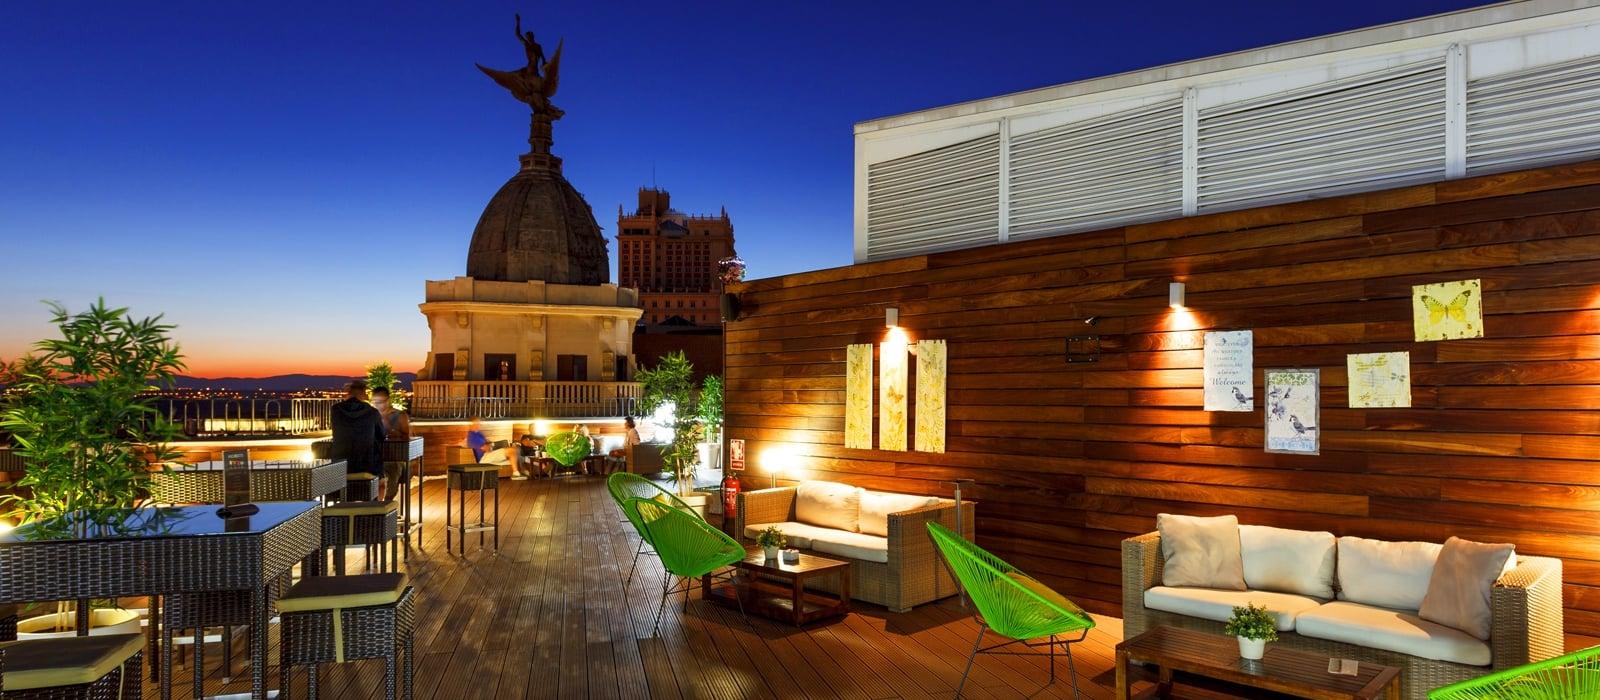 Offerte Via 66 Hotel Vincci Madrid - Benvenuti a Madrid